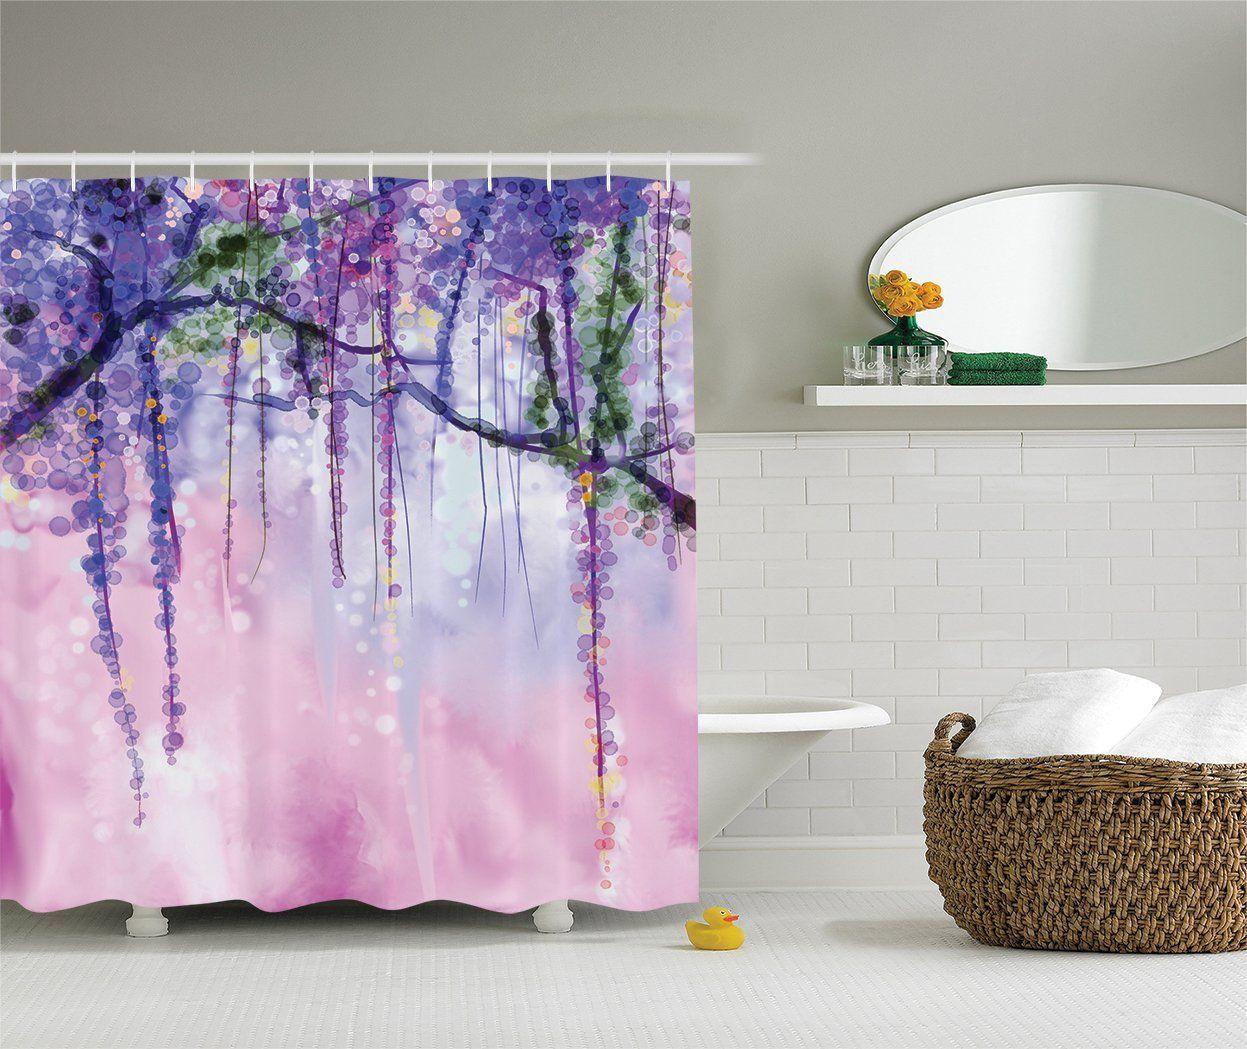 Robot Check Flower Shower Curtain Shower Curtain Decor Decor Collection